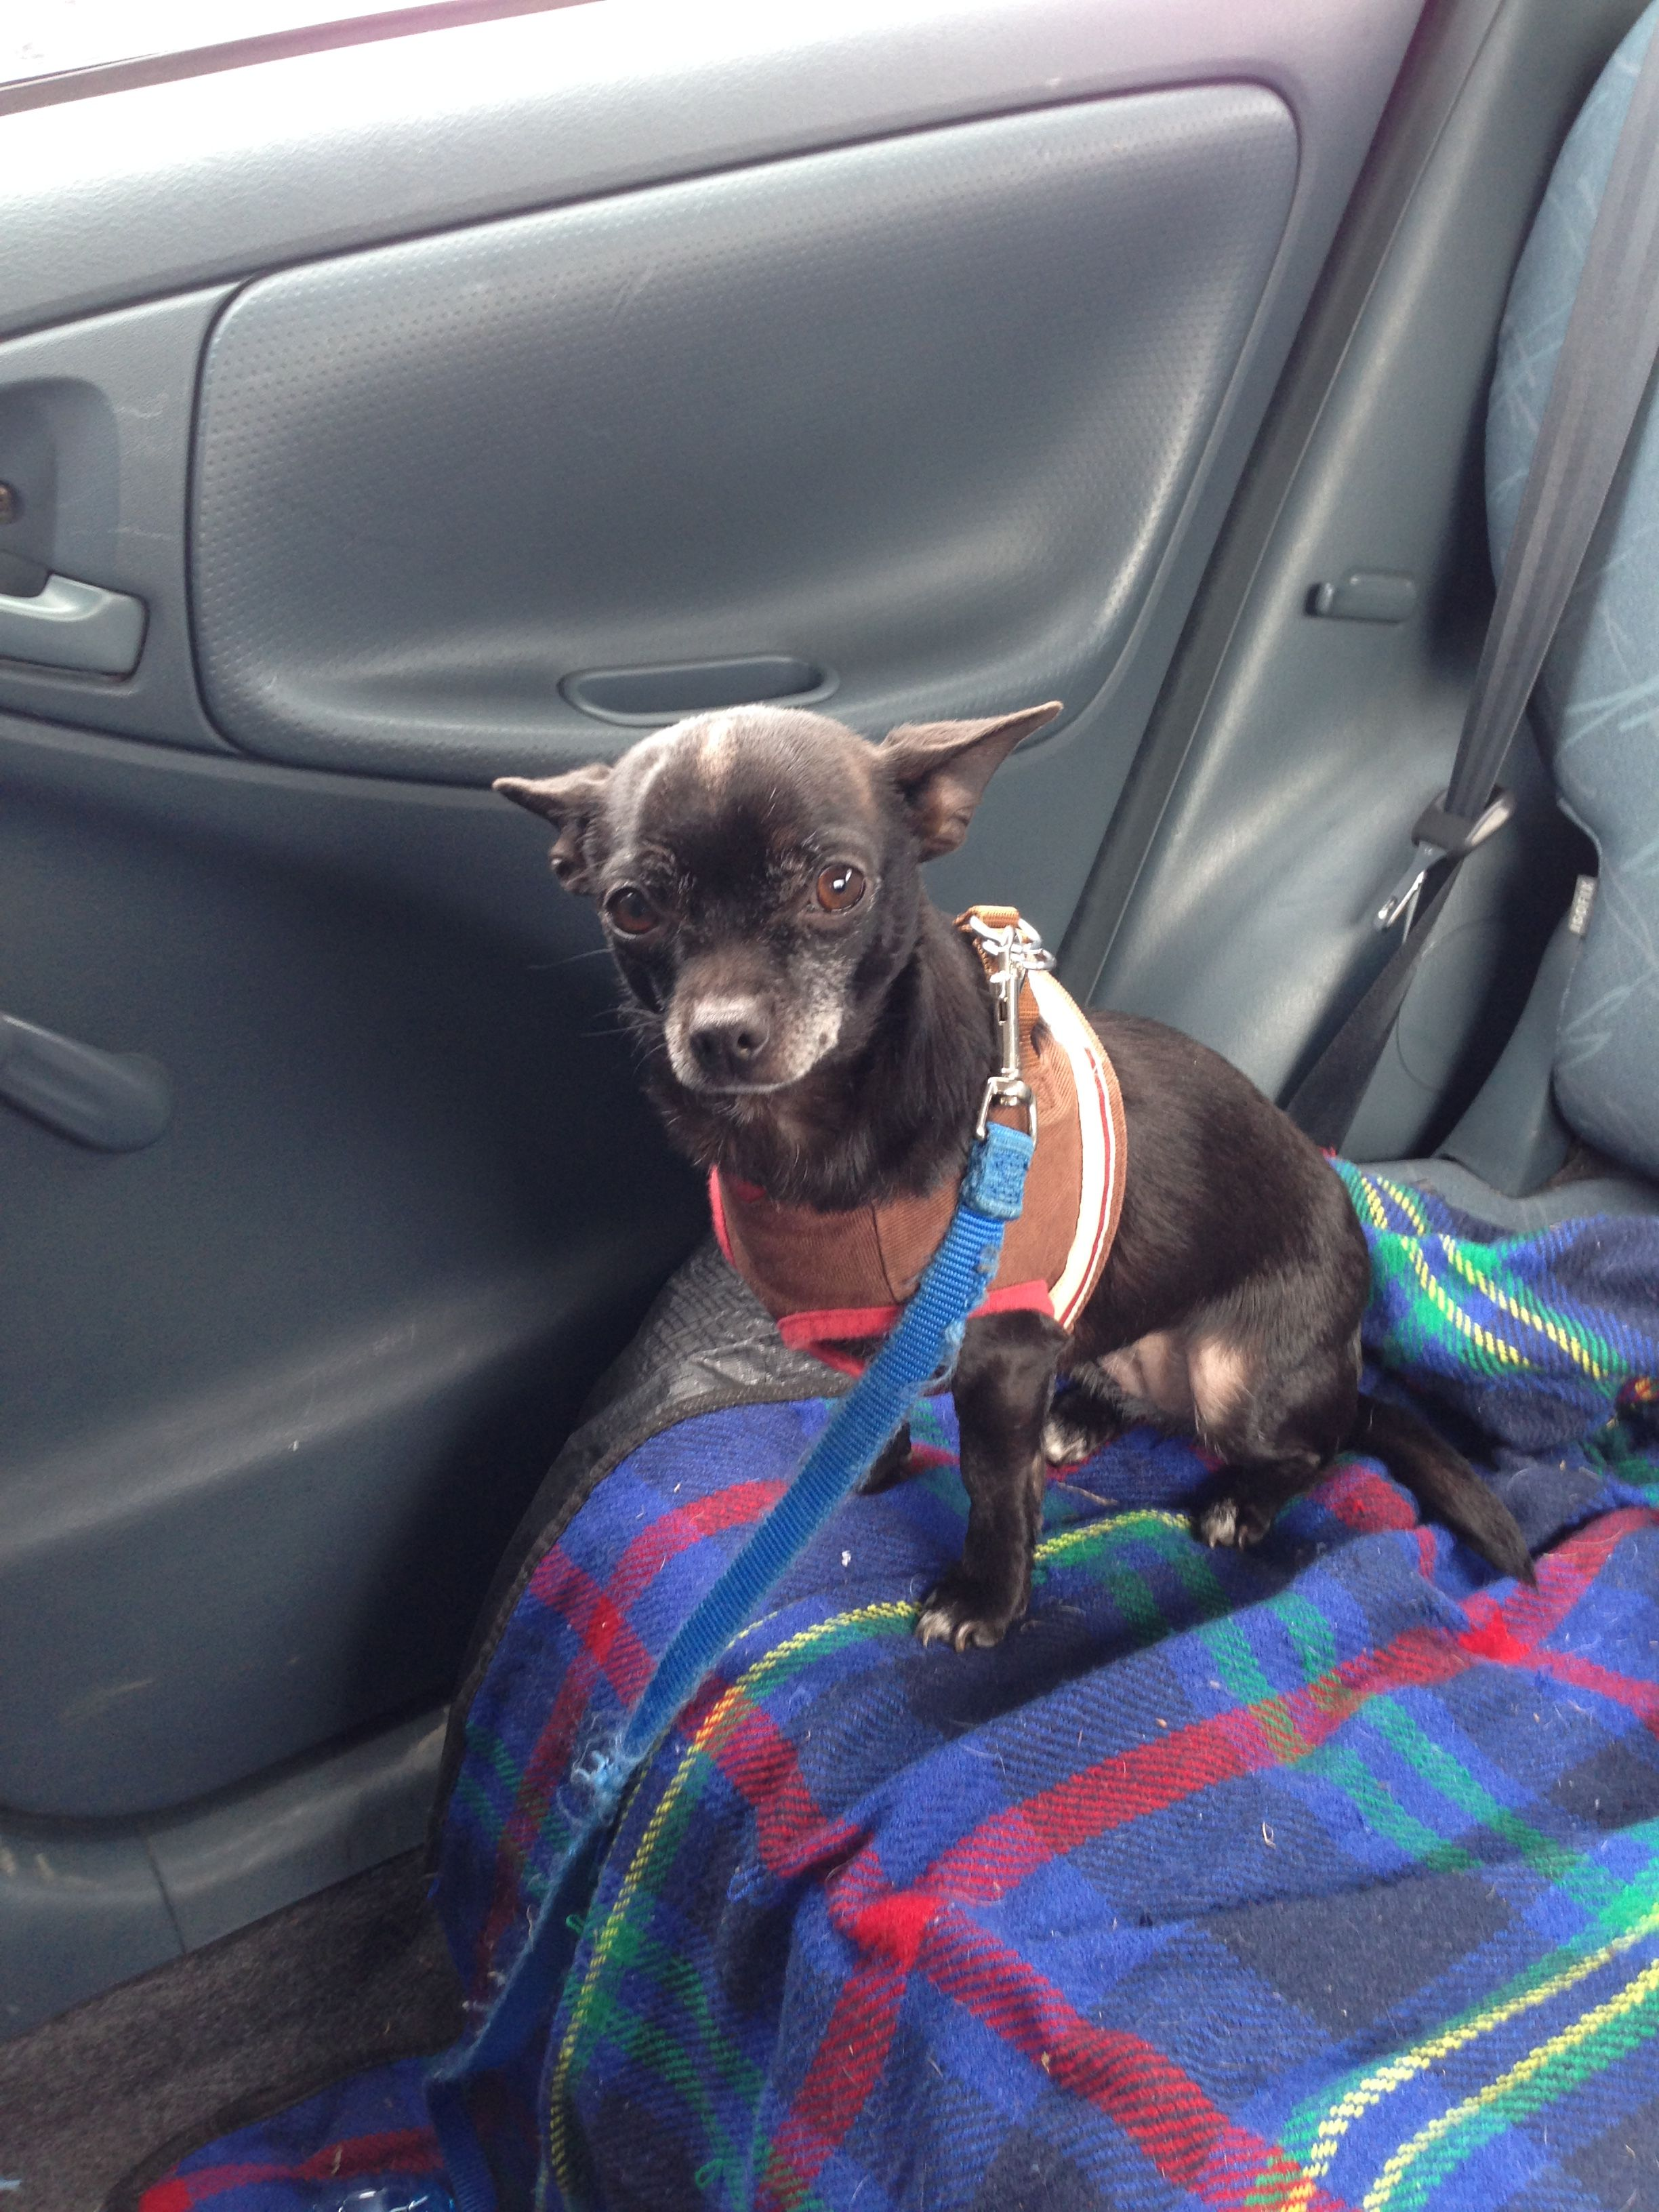 Pixie Chihuahua Pawshake